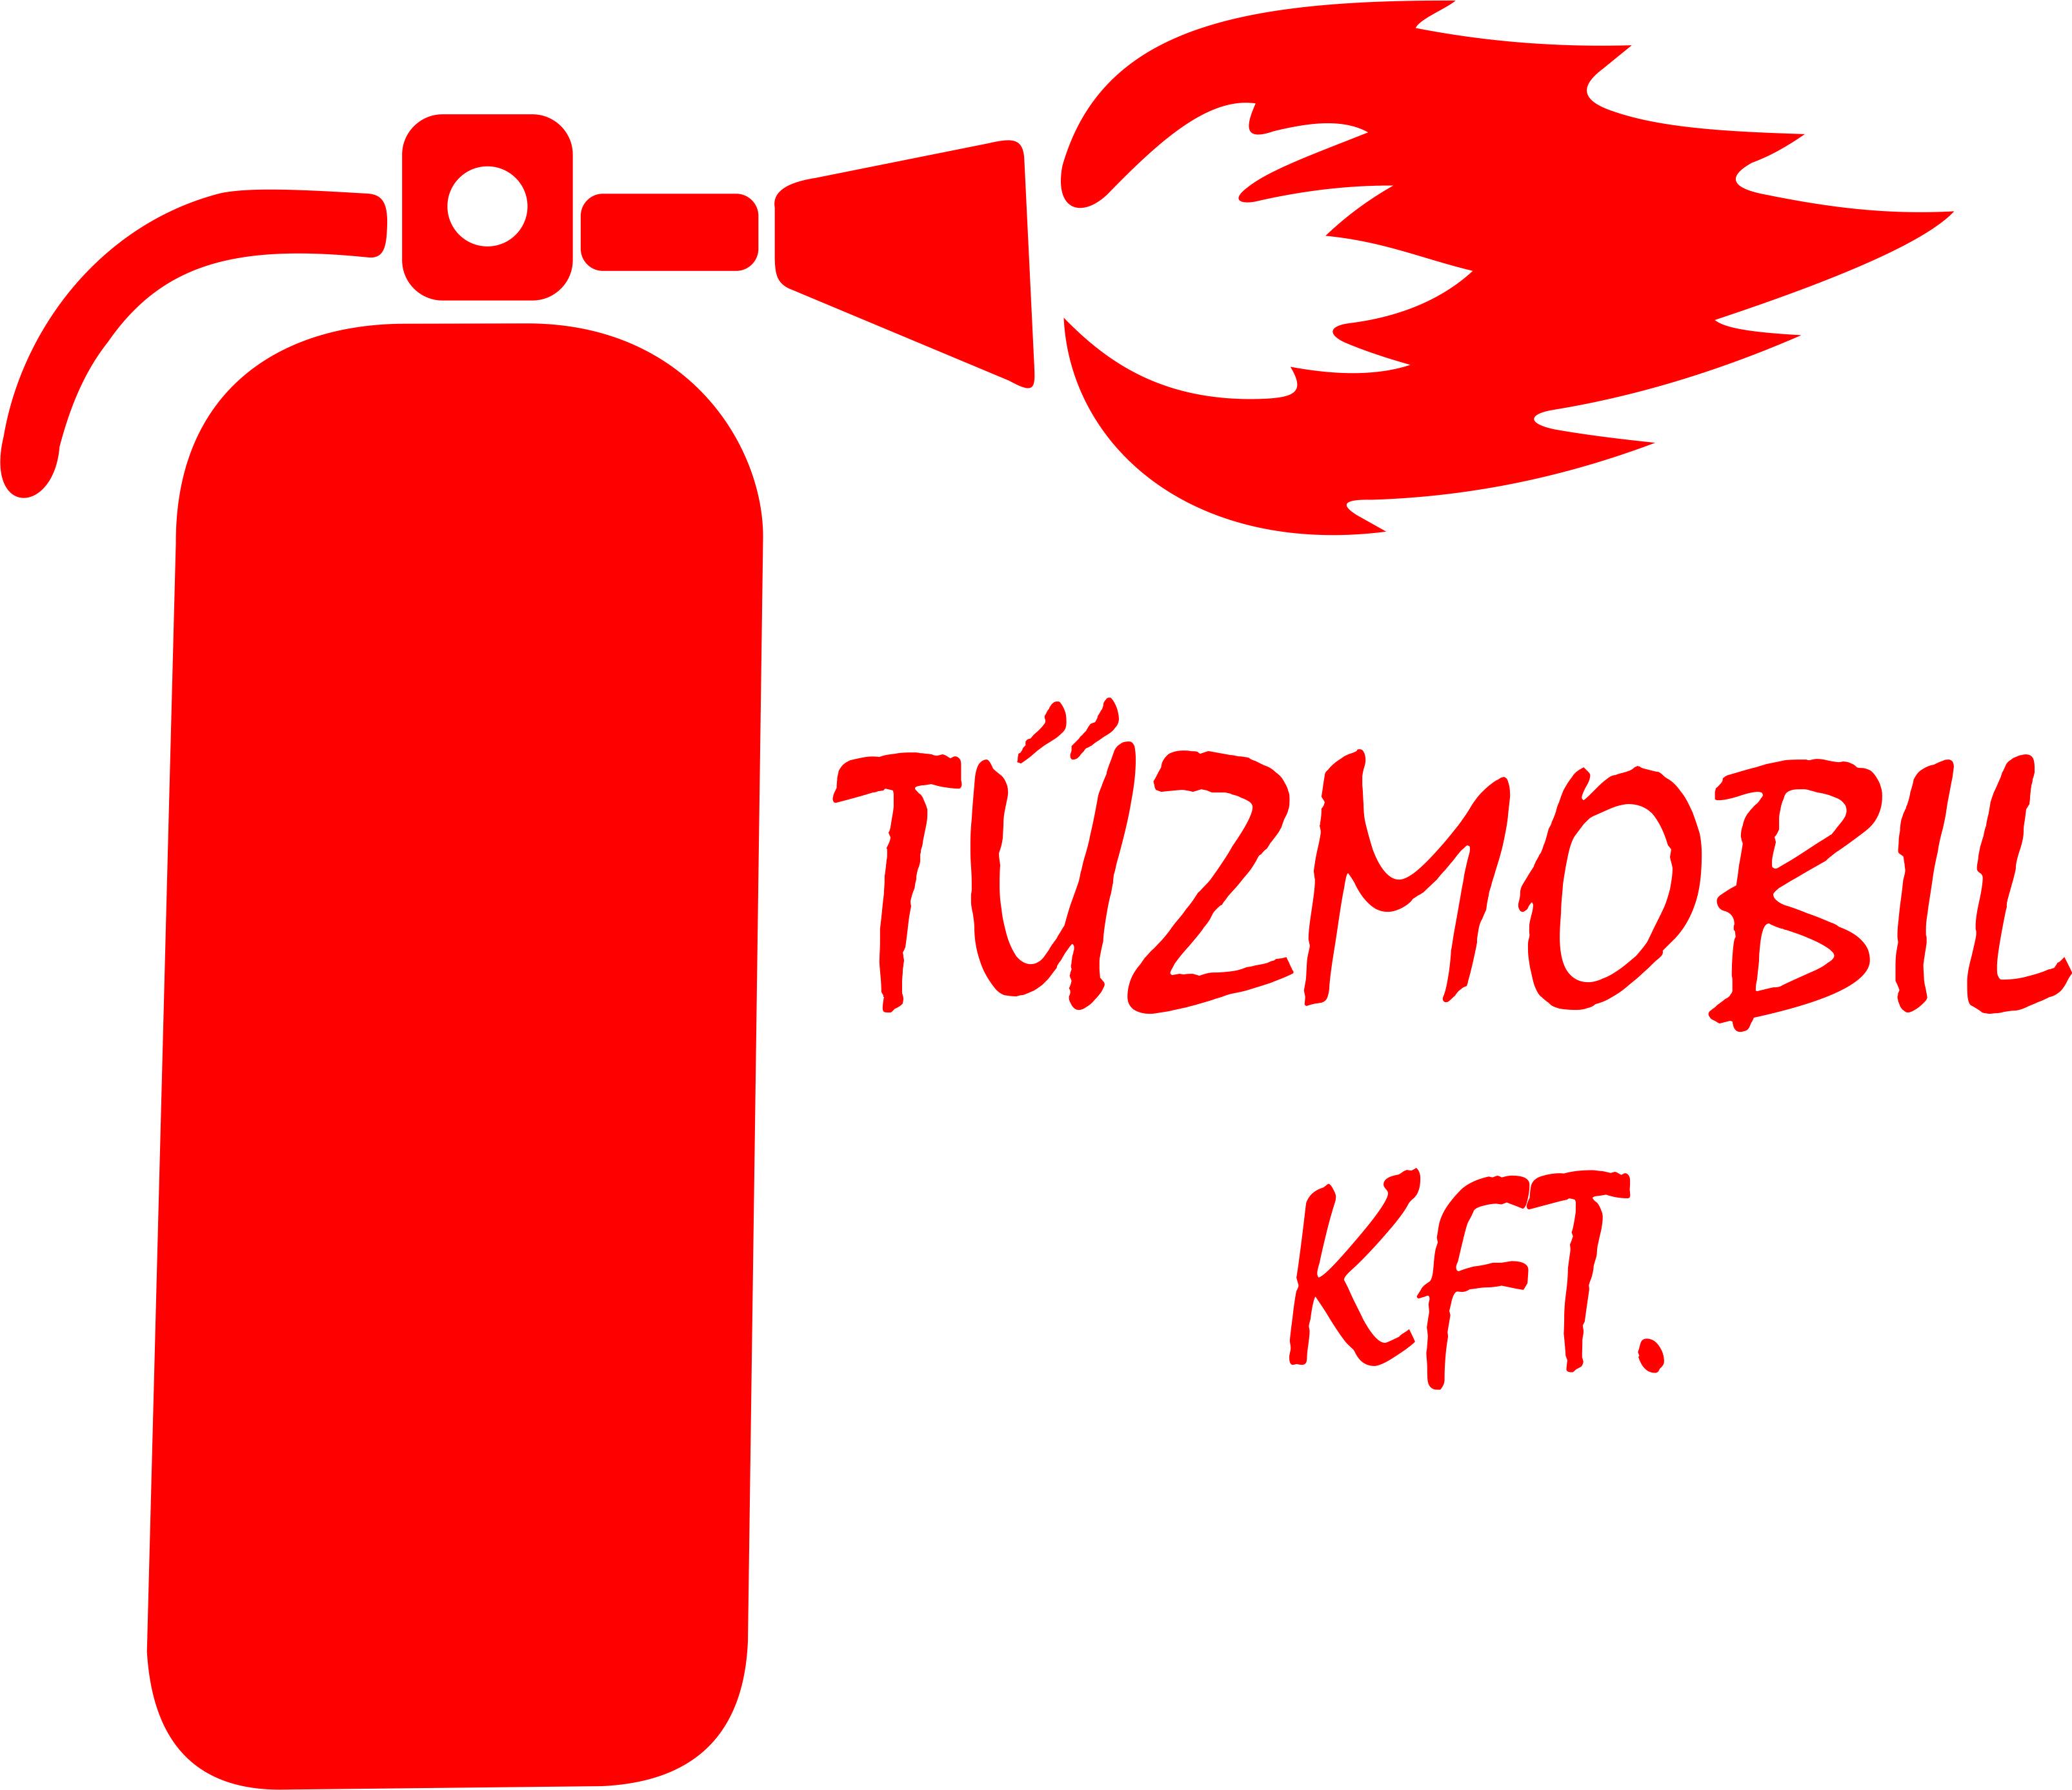 Tűzmobil Kft.